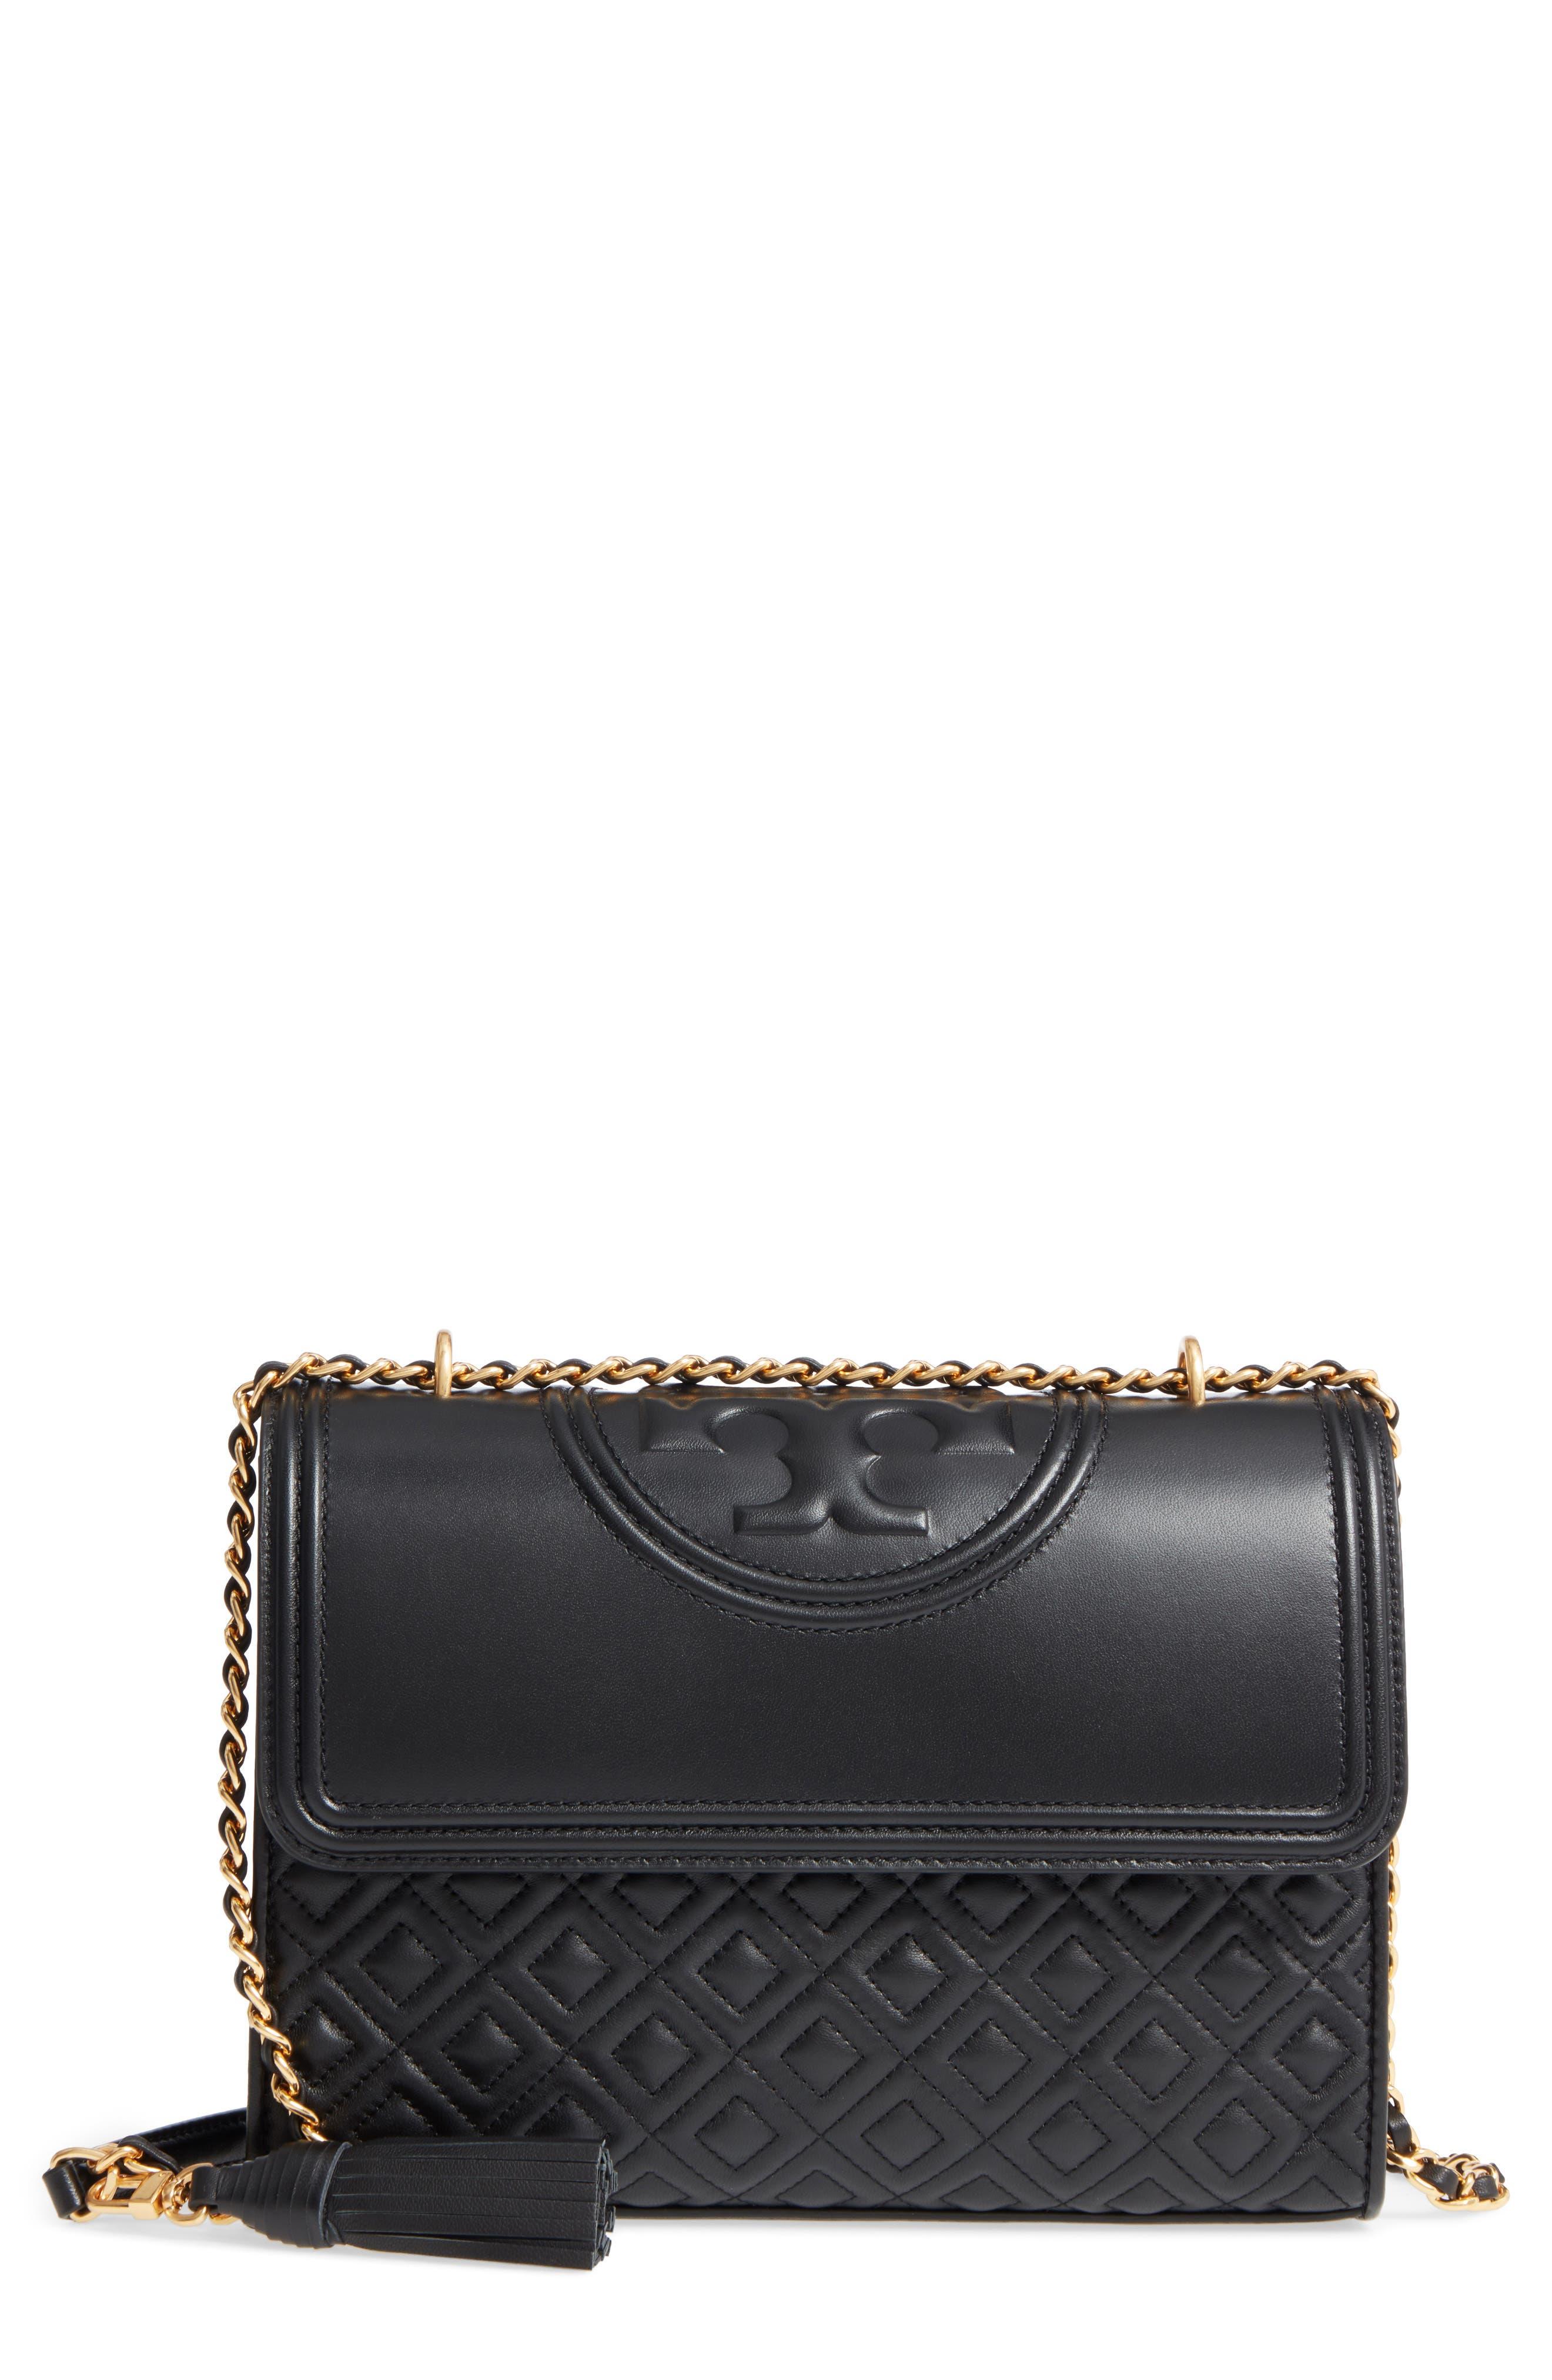 TORY BURCH Fleming Leather Convertible Shoulder Bag, Main, color, BLACK